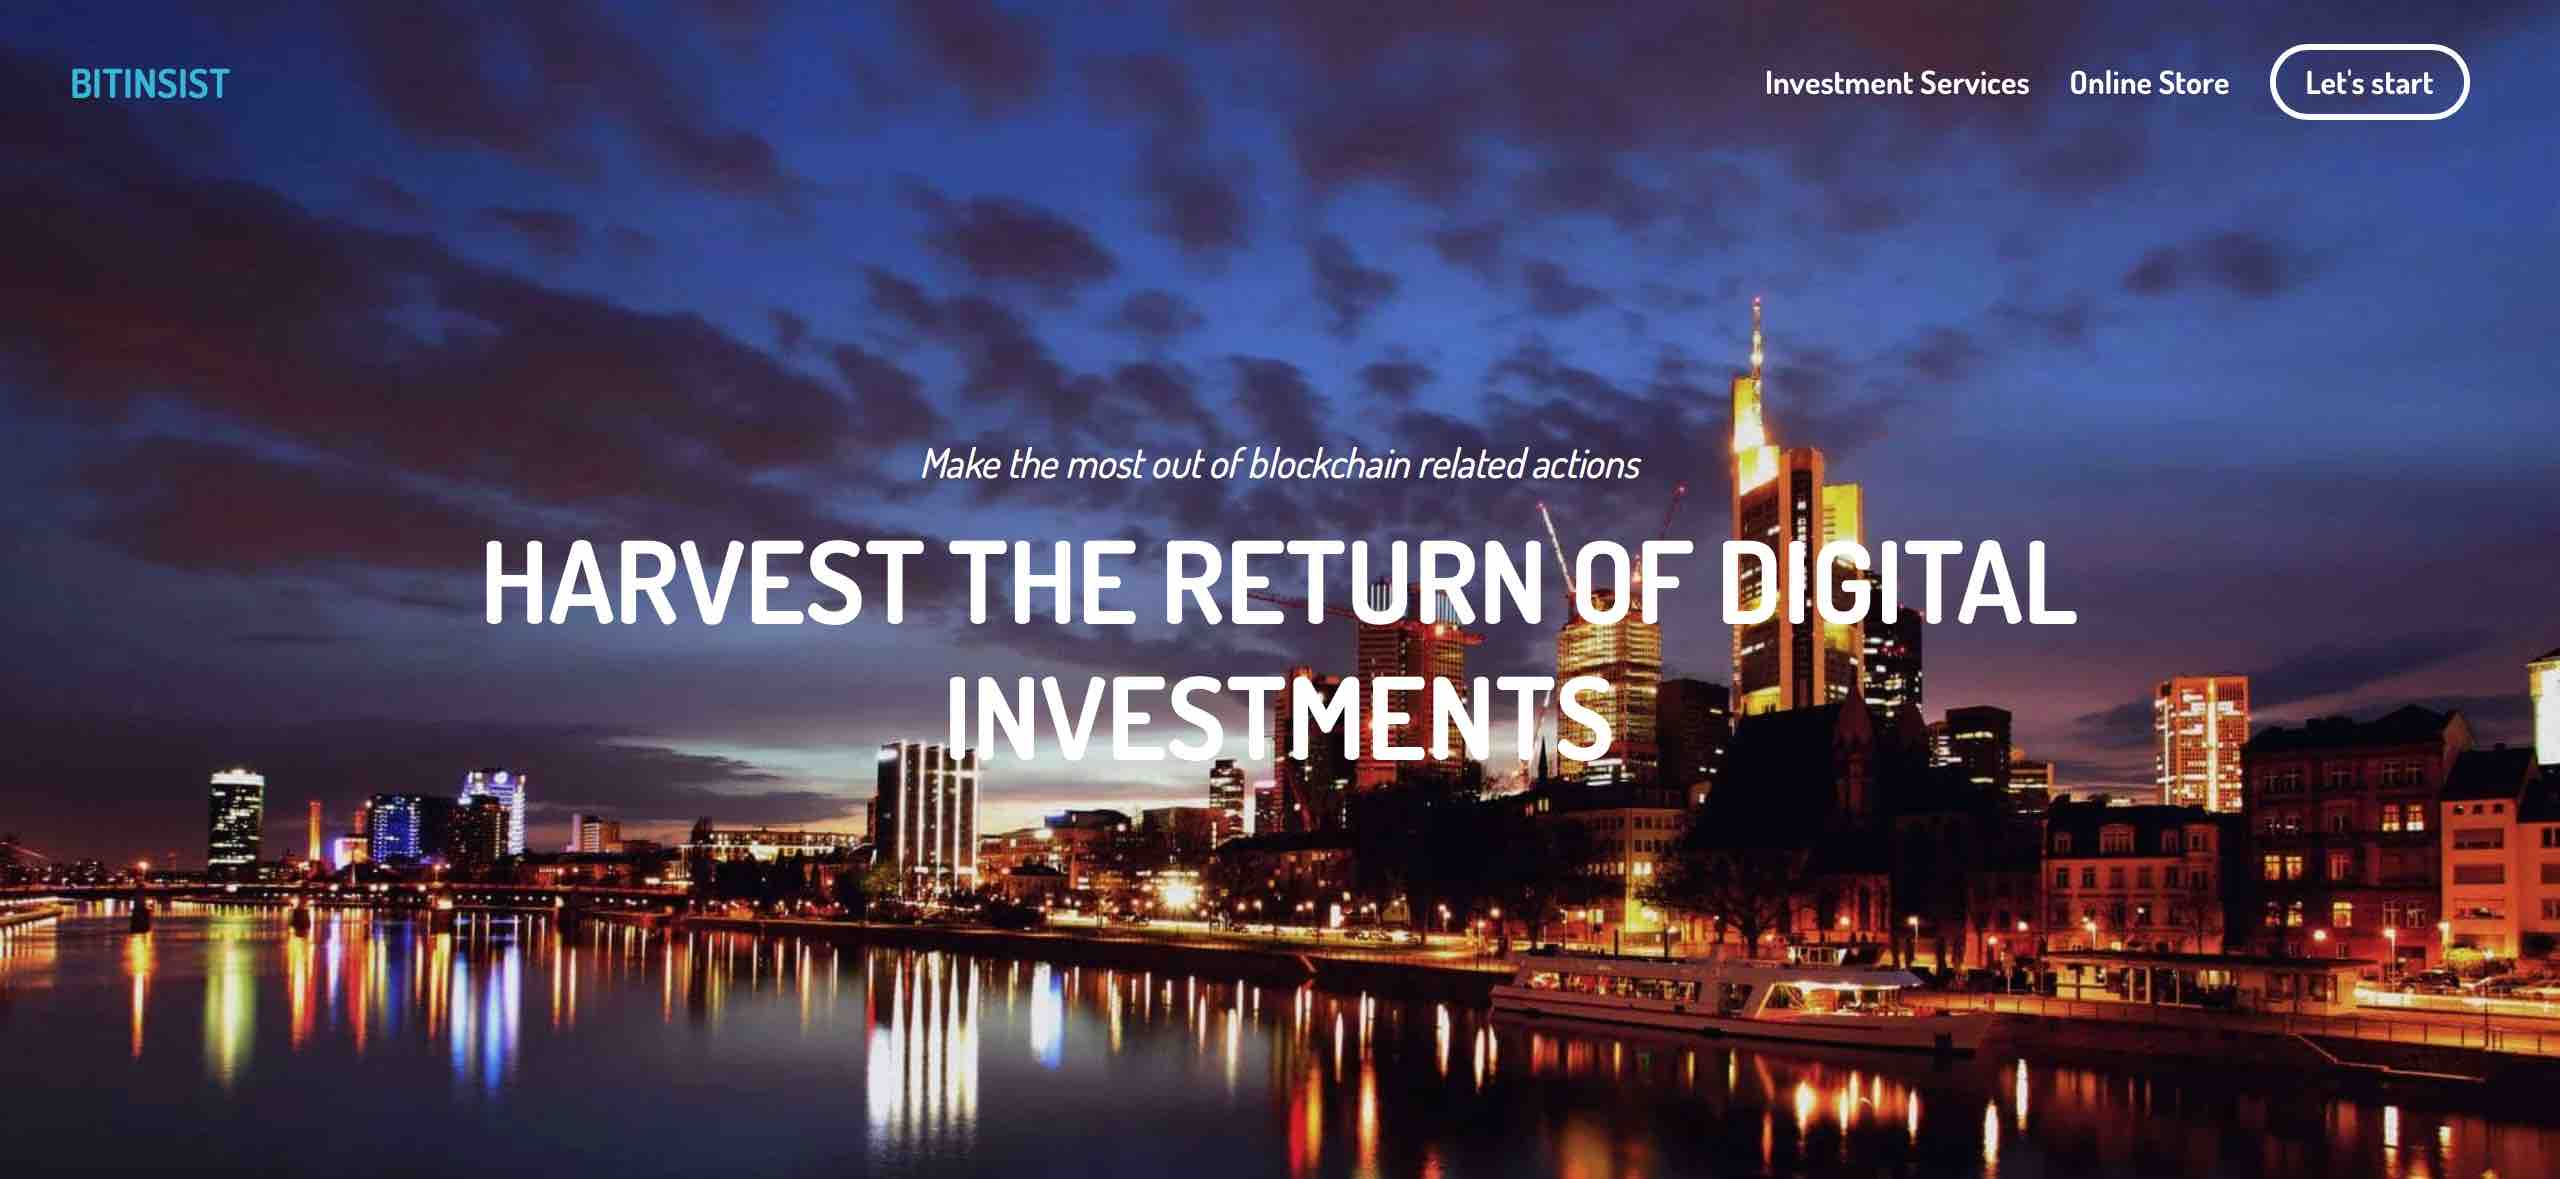 bitinsist bitcoin banyaszat kriptovaluta